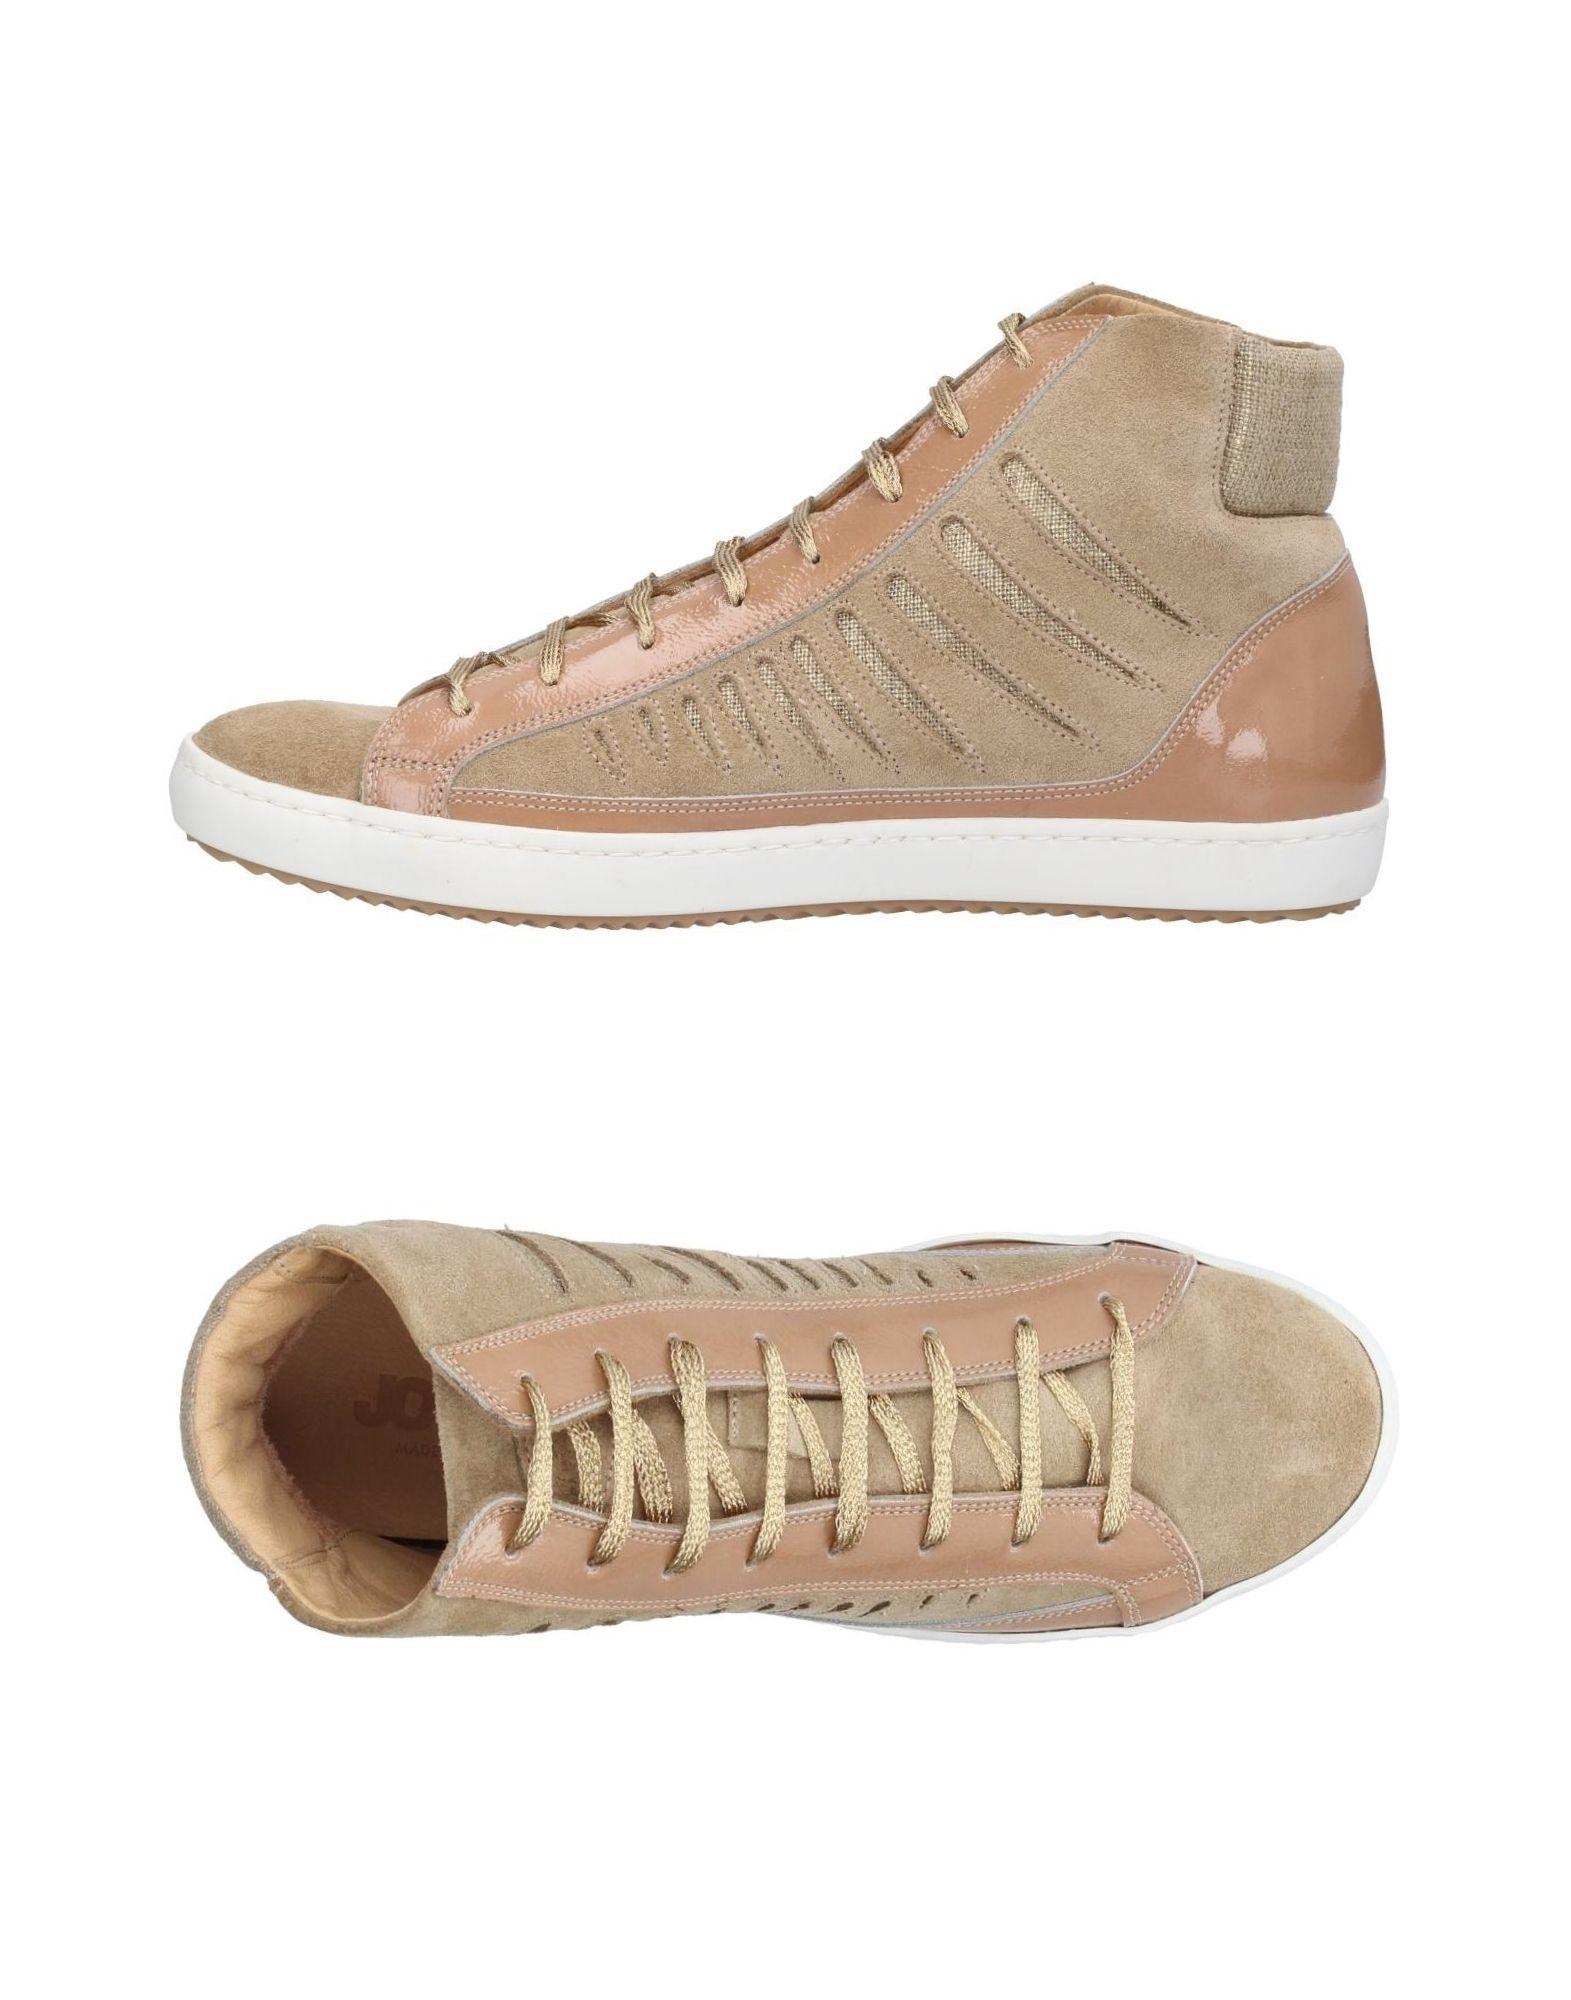 Moda 11405506BW Sneakers Joyks Donna - 11405506BW Moda e76340